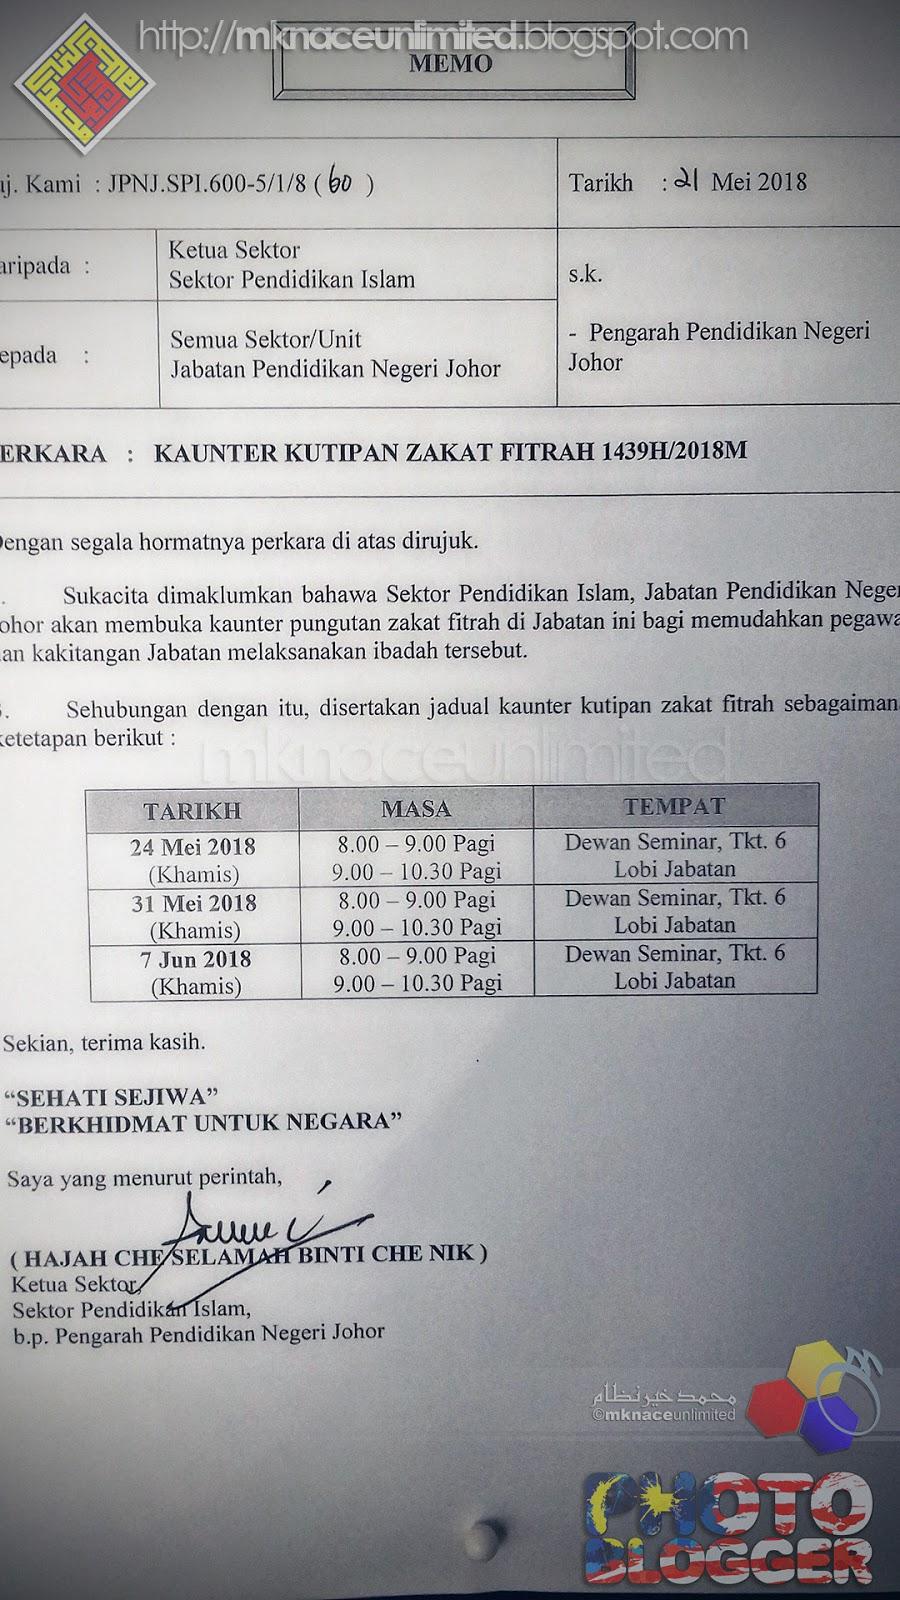 Kaunter Kutipan Zakat Fitrah 1439h 2018 Jpn Johor